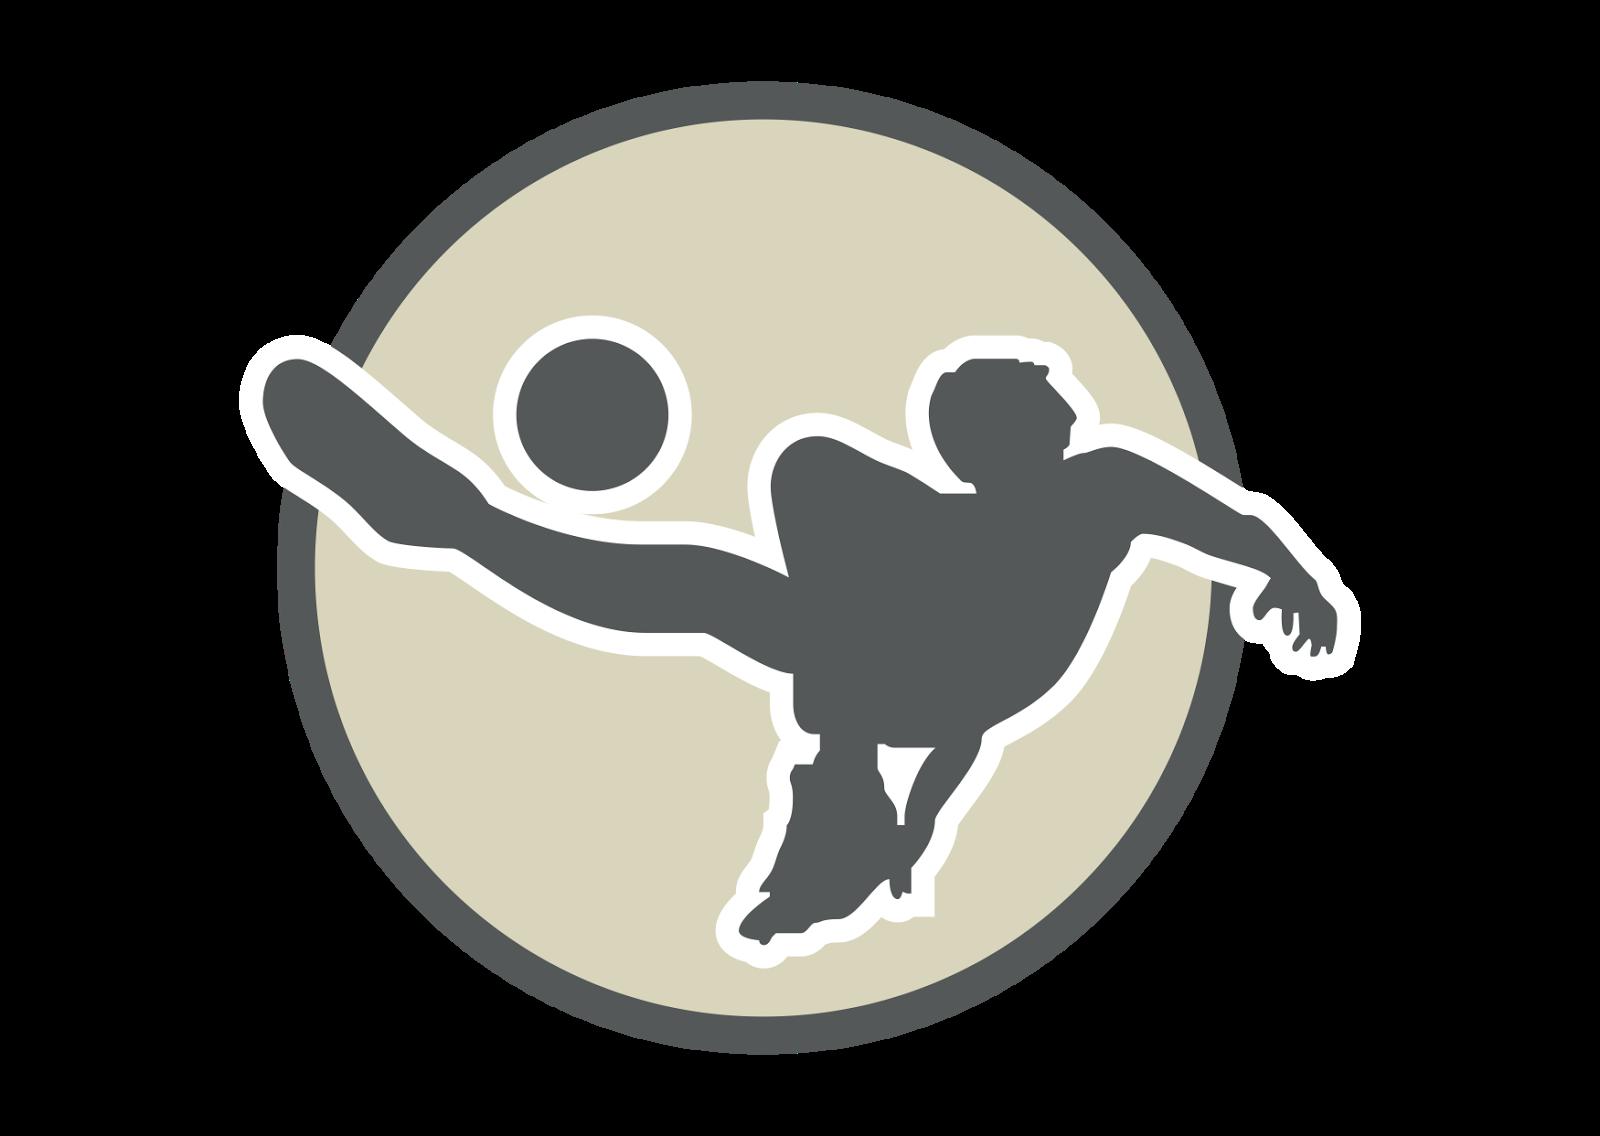 Bassano Virtus 55 Soccer Team Logo Vector - Socar, Transparent background PNG HD thumbnail